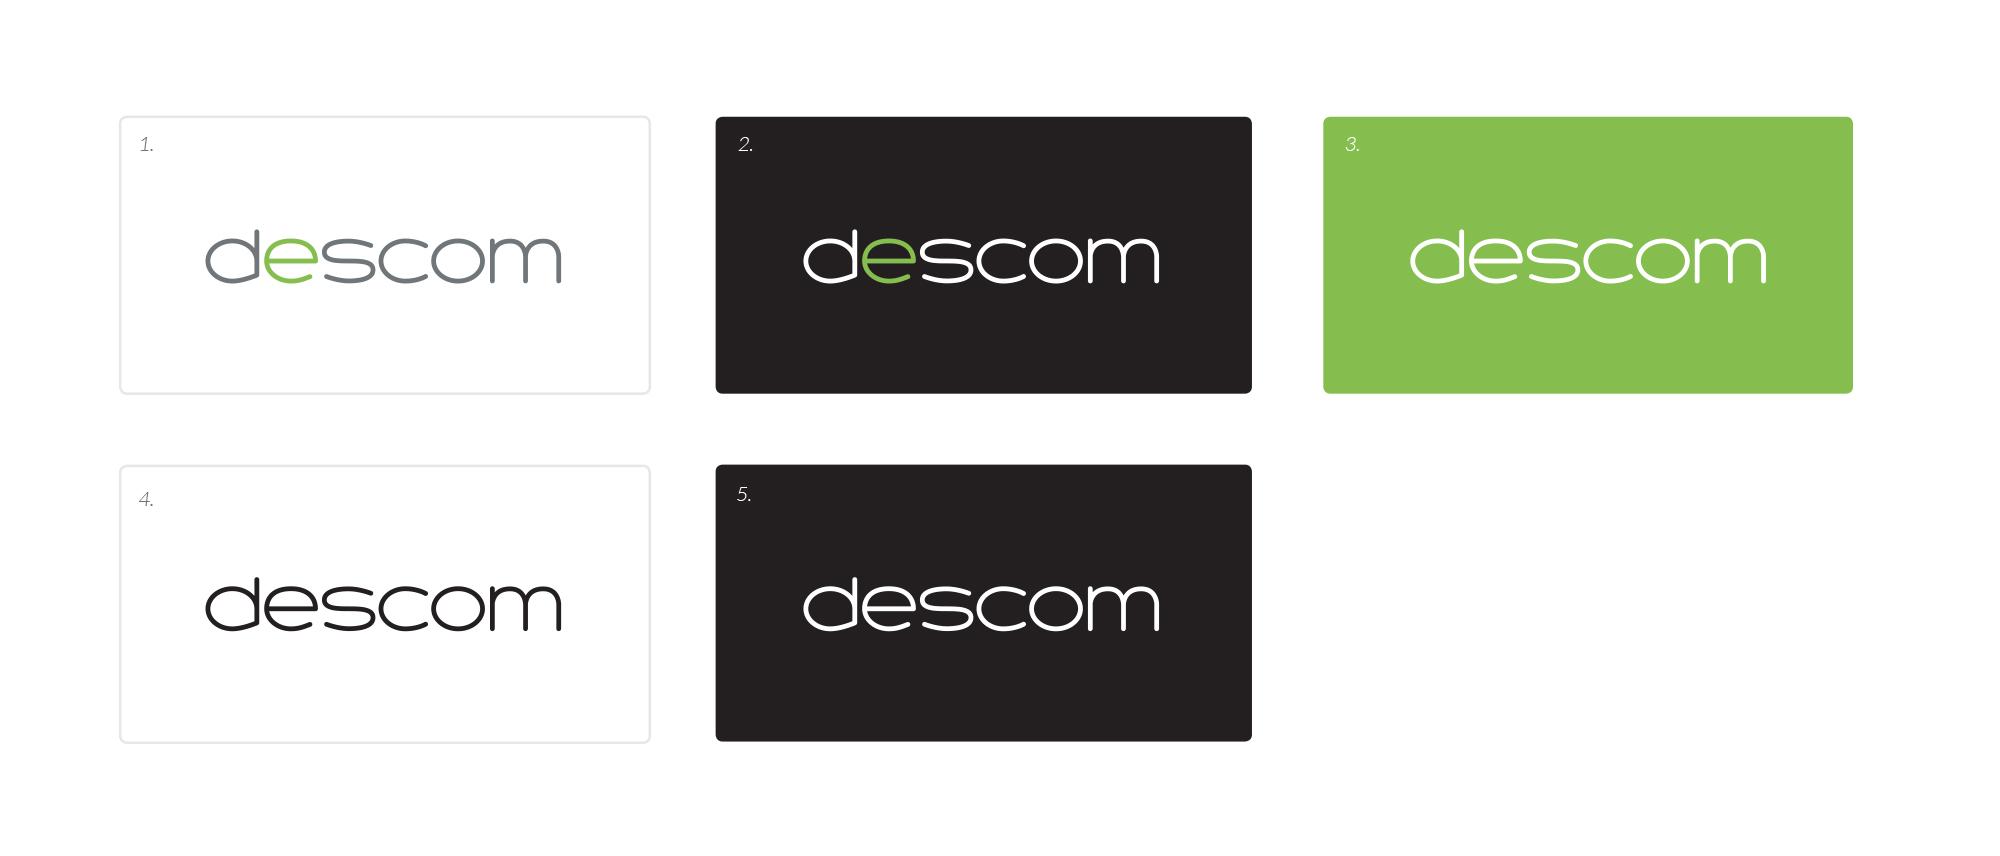 descom_logot